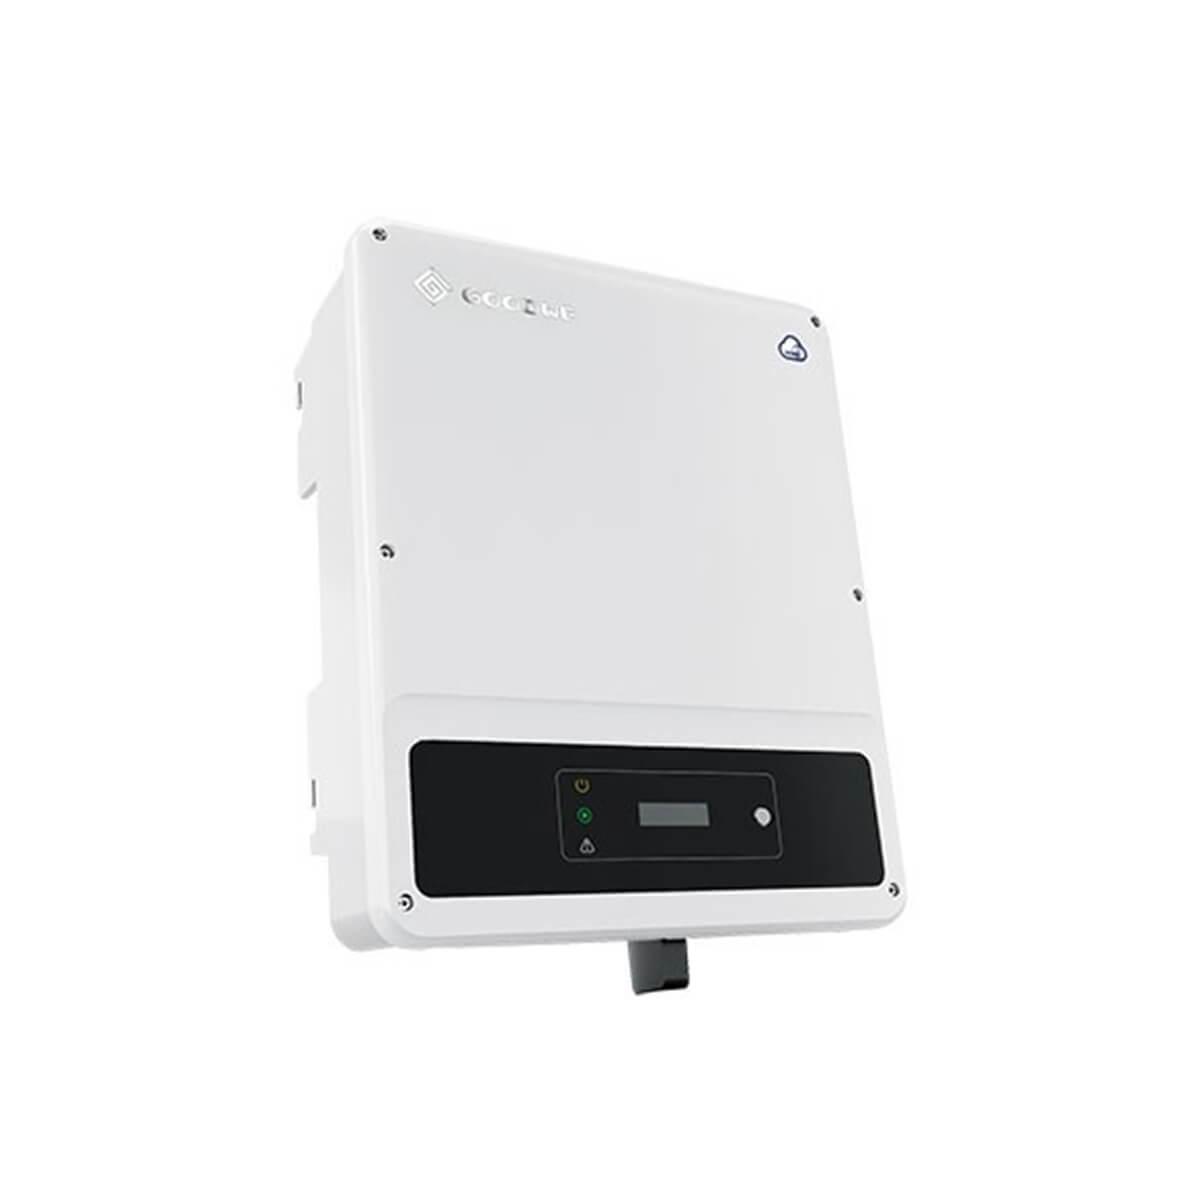 goodwe 4.2kW inverter, goodwe gw4200d-ns 4.2kW inverter, goodwe gw4200d-ns inverter, goodwe gw4200d-ns, goodwe 4.2 kW, GOODWE 4.2 KW